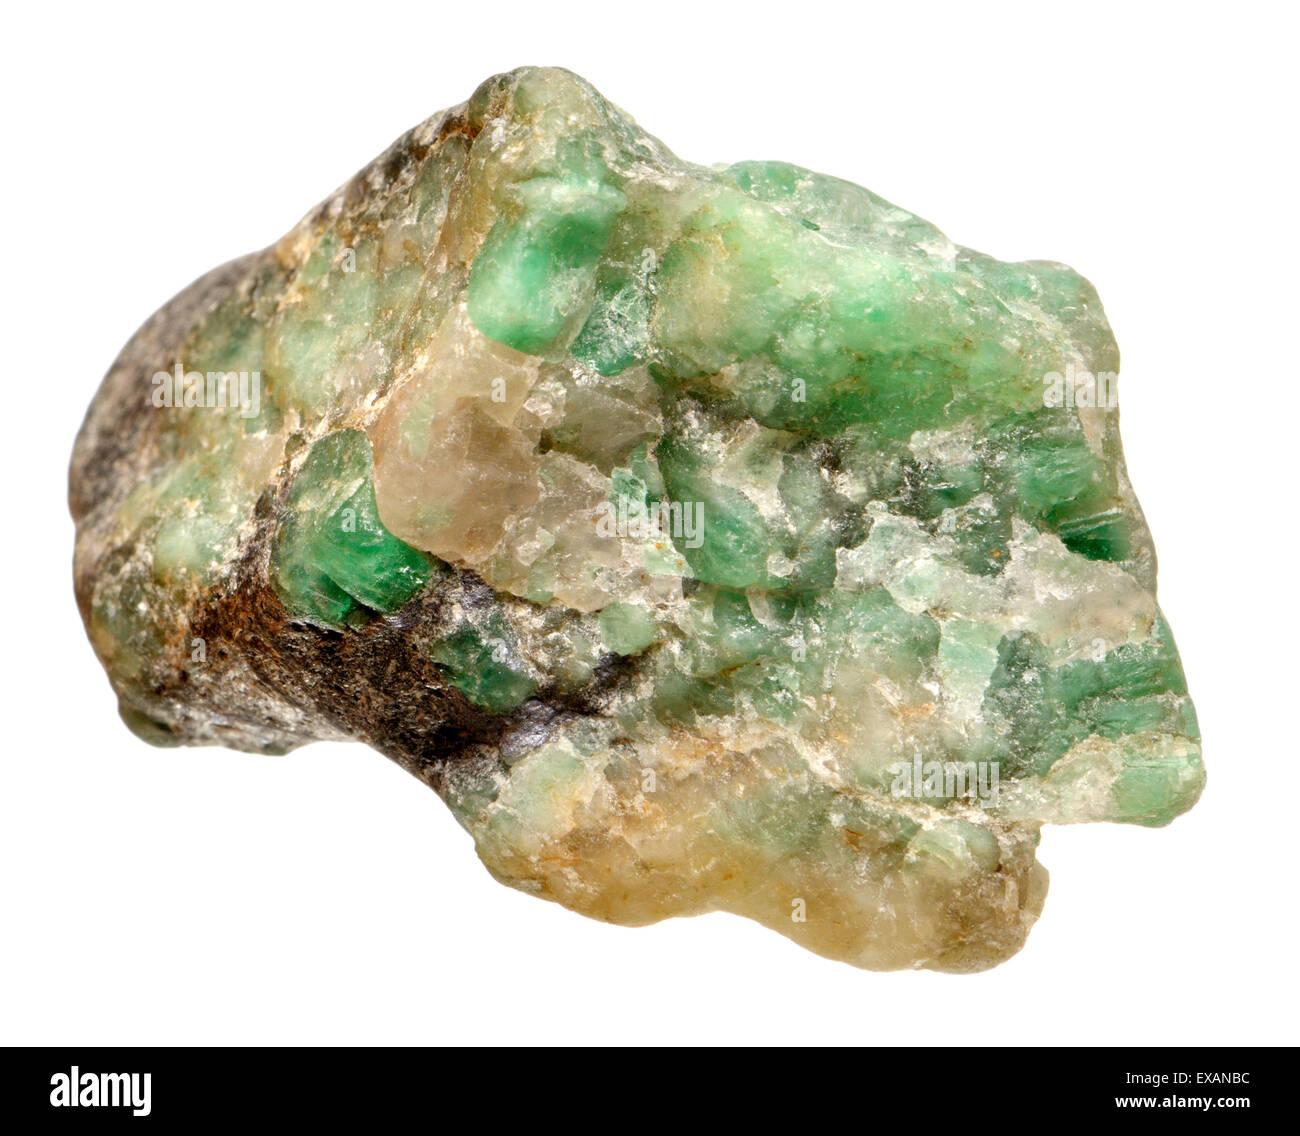 Rough uncut Emerald - Stock Image